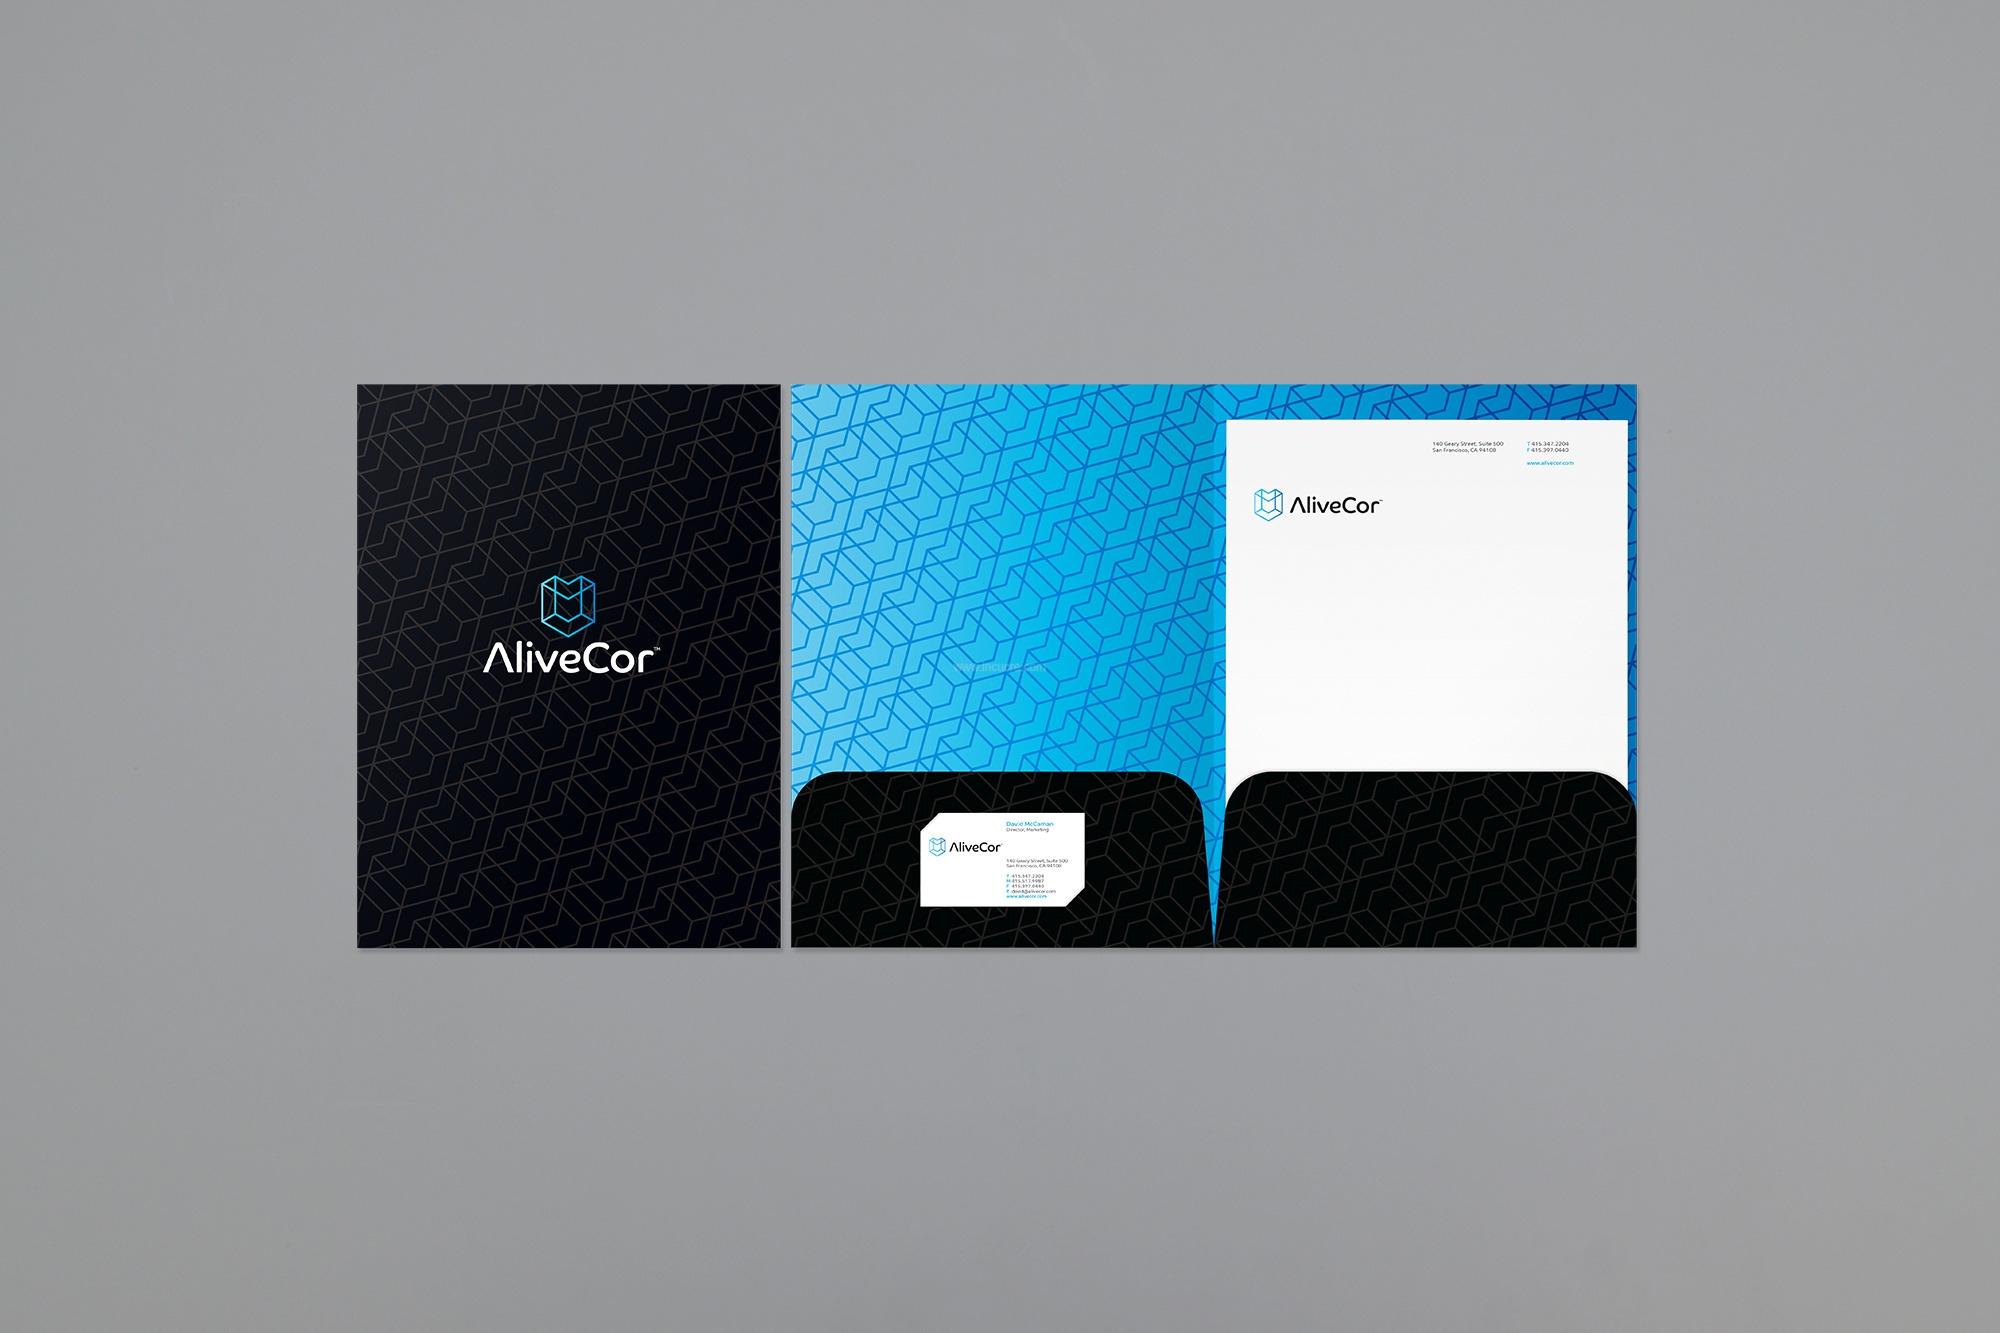 AliveCor_HypeType-folder_2000